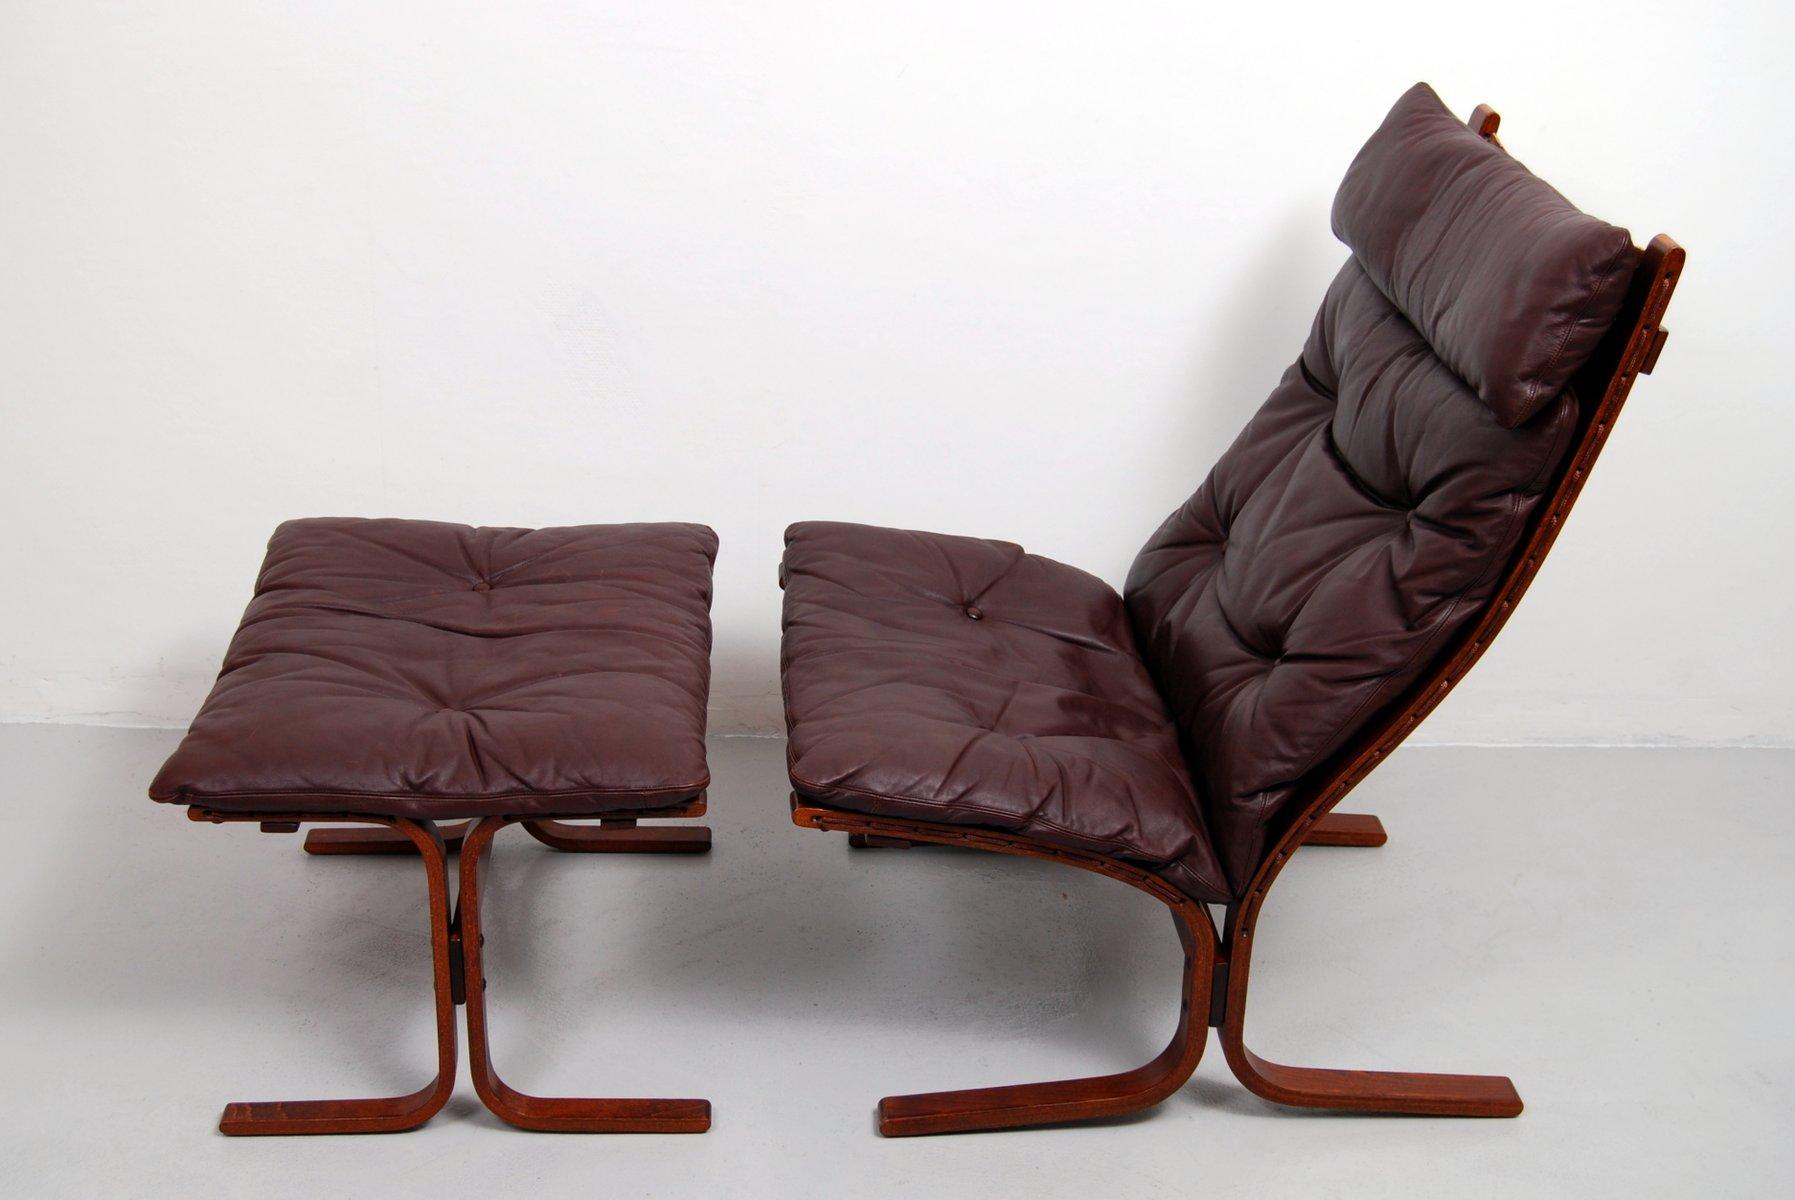 Miraculous Vintage Siesta High Back Sling Lounge Chair Ottoman By Ingmar Relling For Westnofa Spiritservingveterans Wood Chair Design Ideas Spiritservingveteransorg